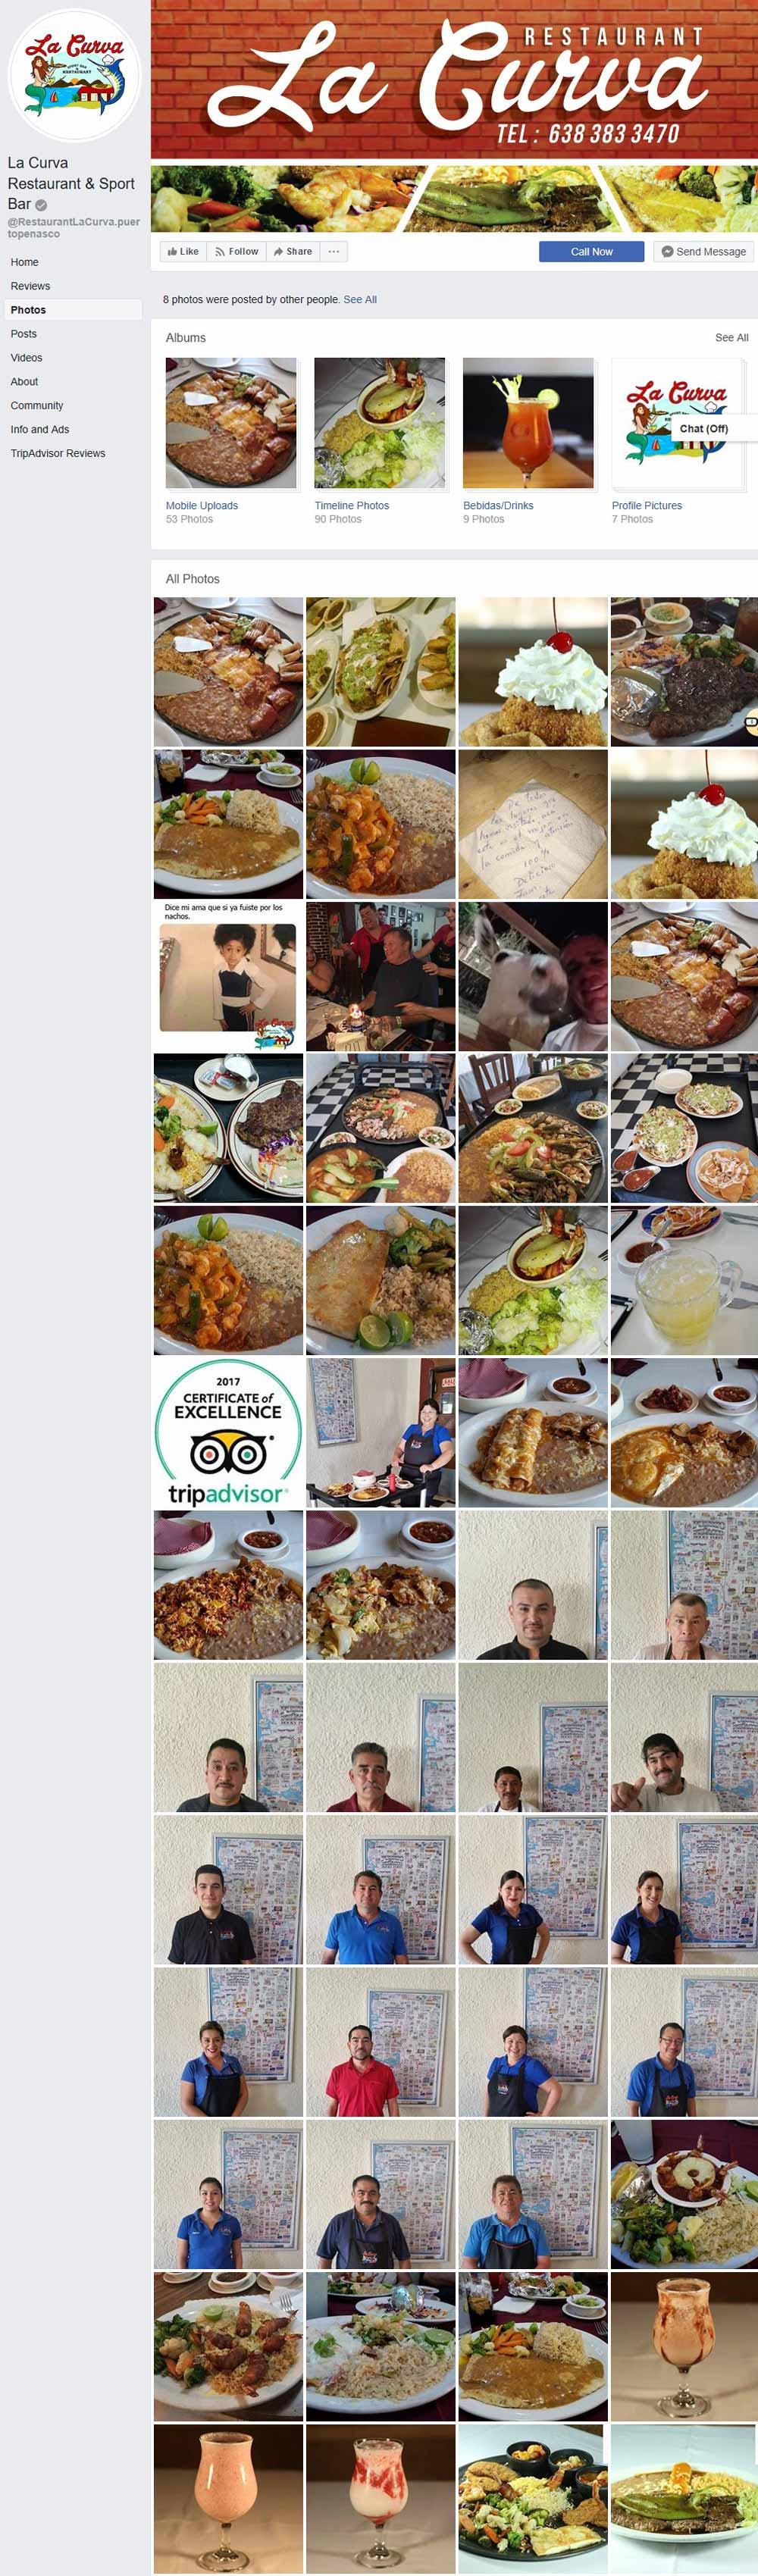 La Curva Restaurant in Puerto Penasco (Rocky Point Mexico). Click here to visit La Curva's website.